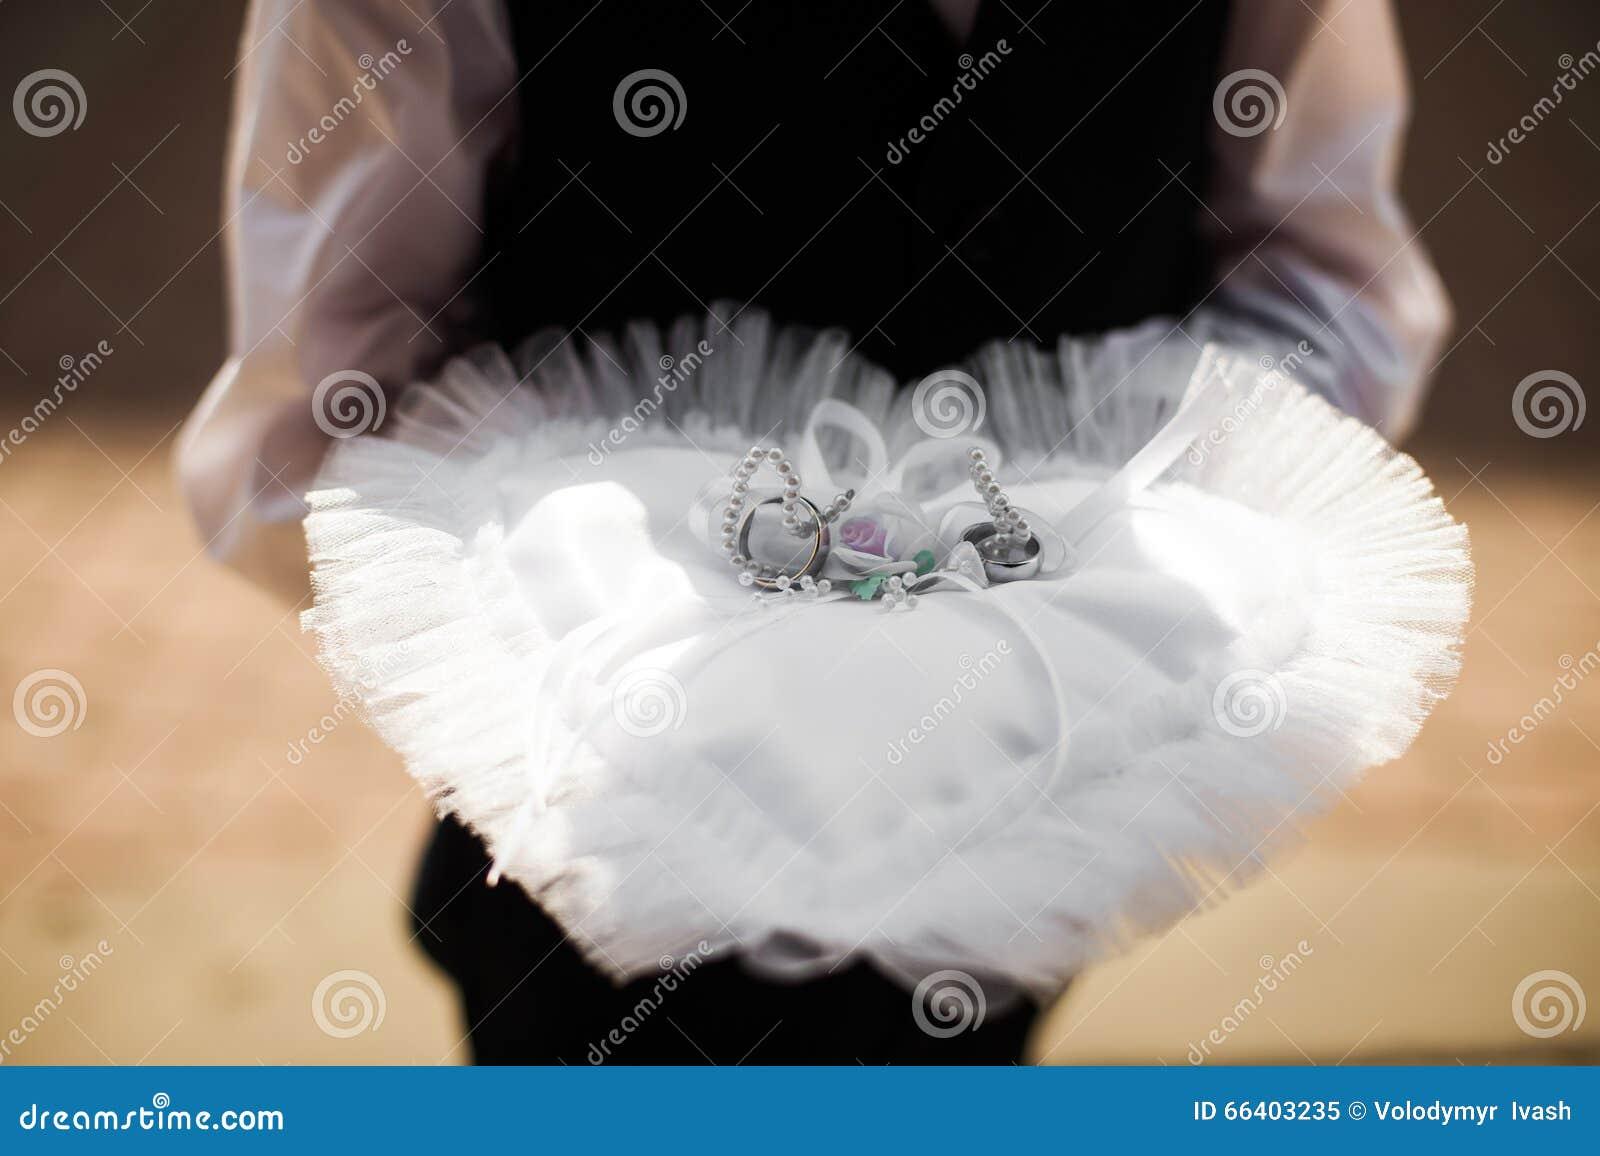 Little Boy Ring Bearer Holding Two Luxury Wedding Rings Closeup: Wedding Band Little Boy At Reisefeber.org